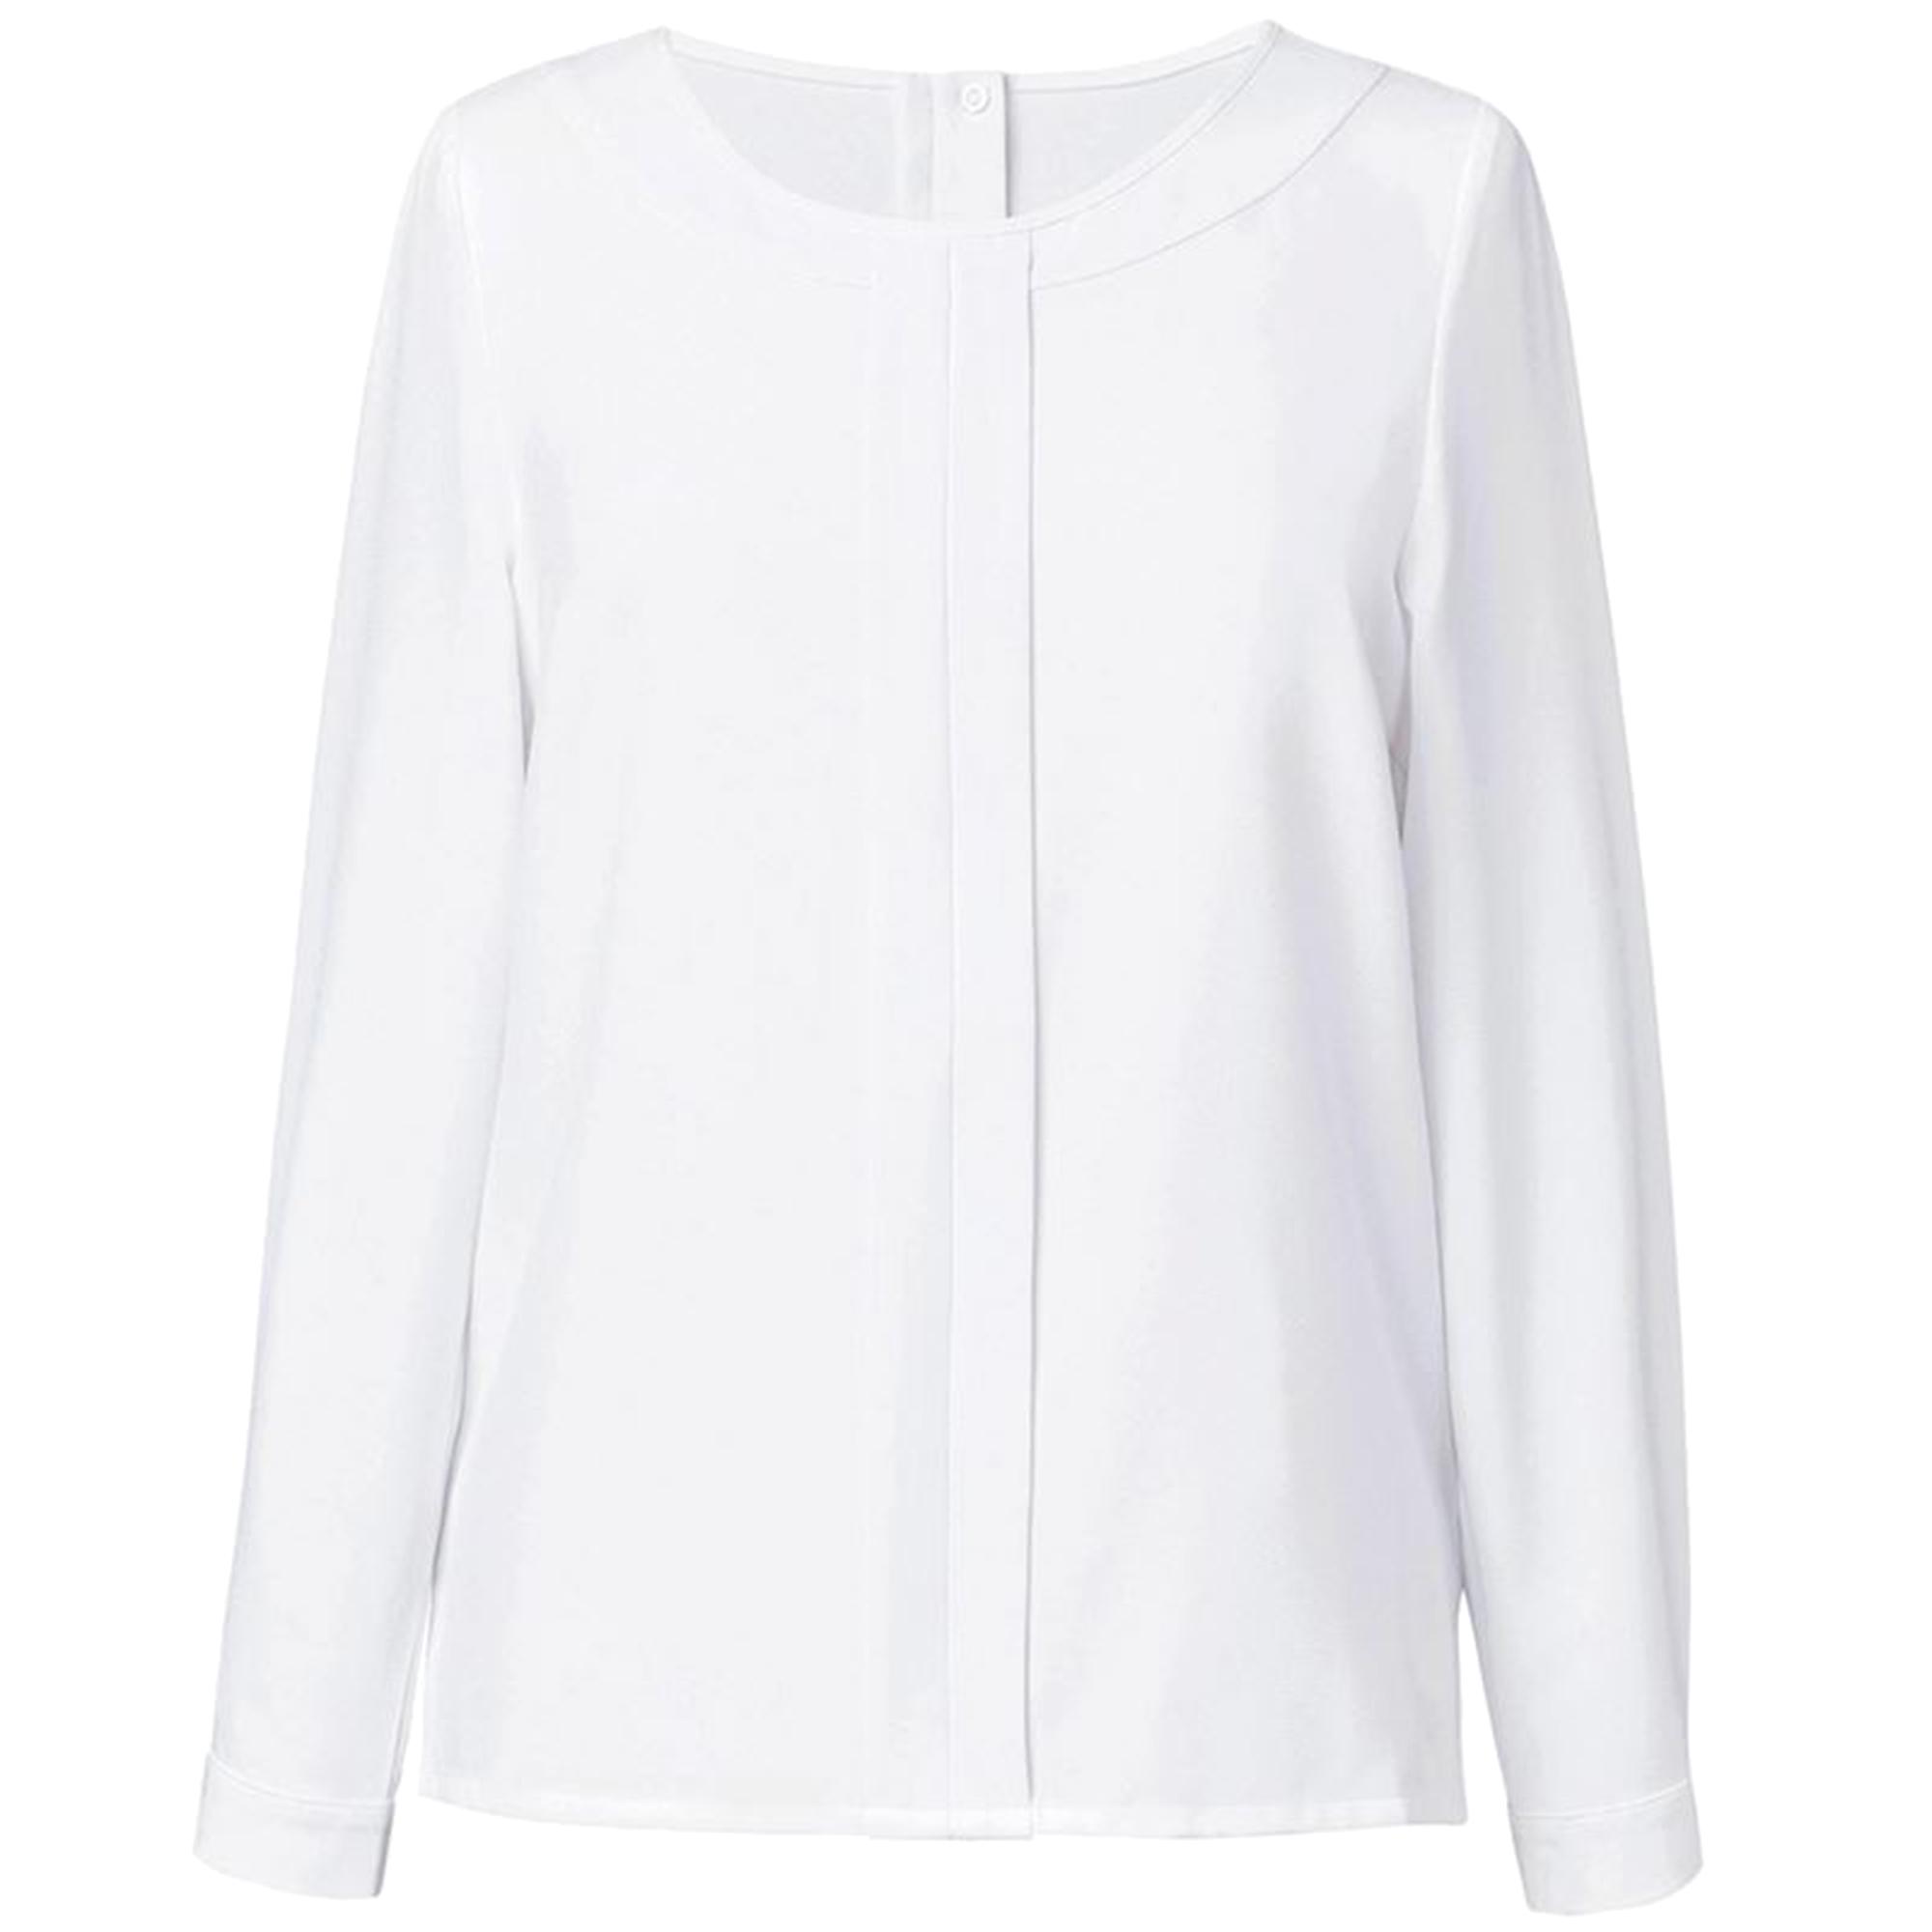 Brook-Taverner-Blusa-de-manga-larga-modelo-Riola-para-mujer-RW5377